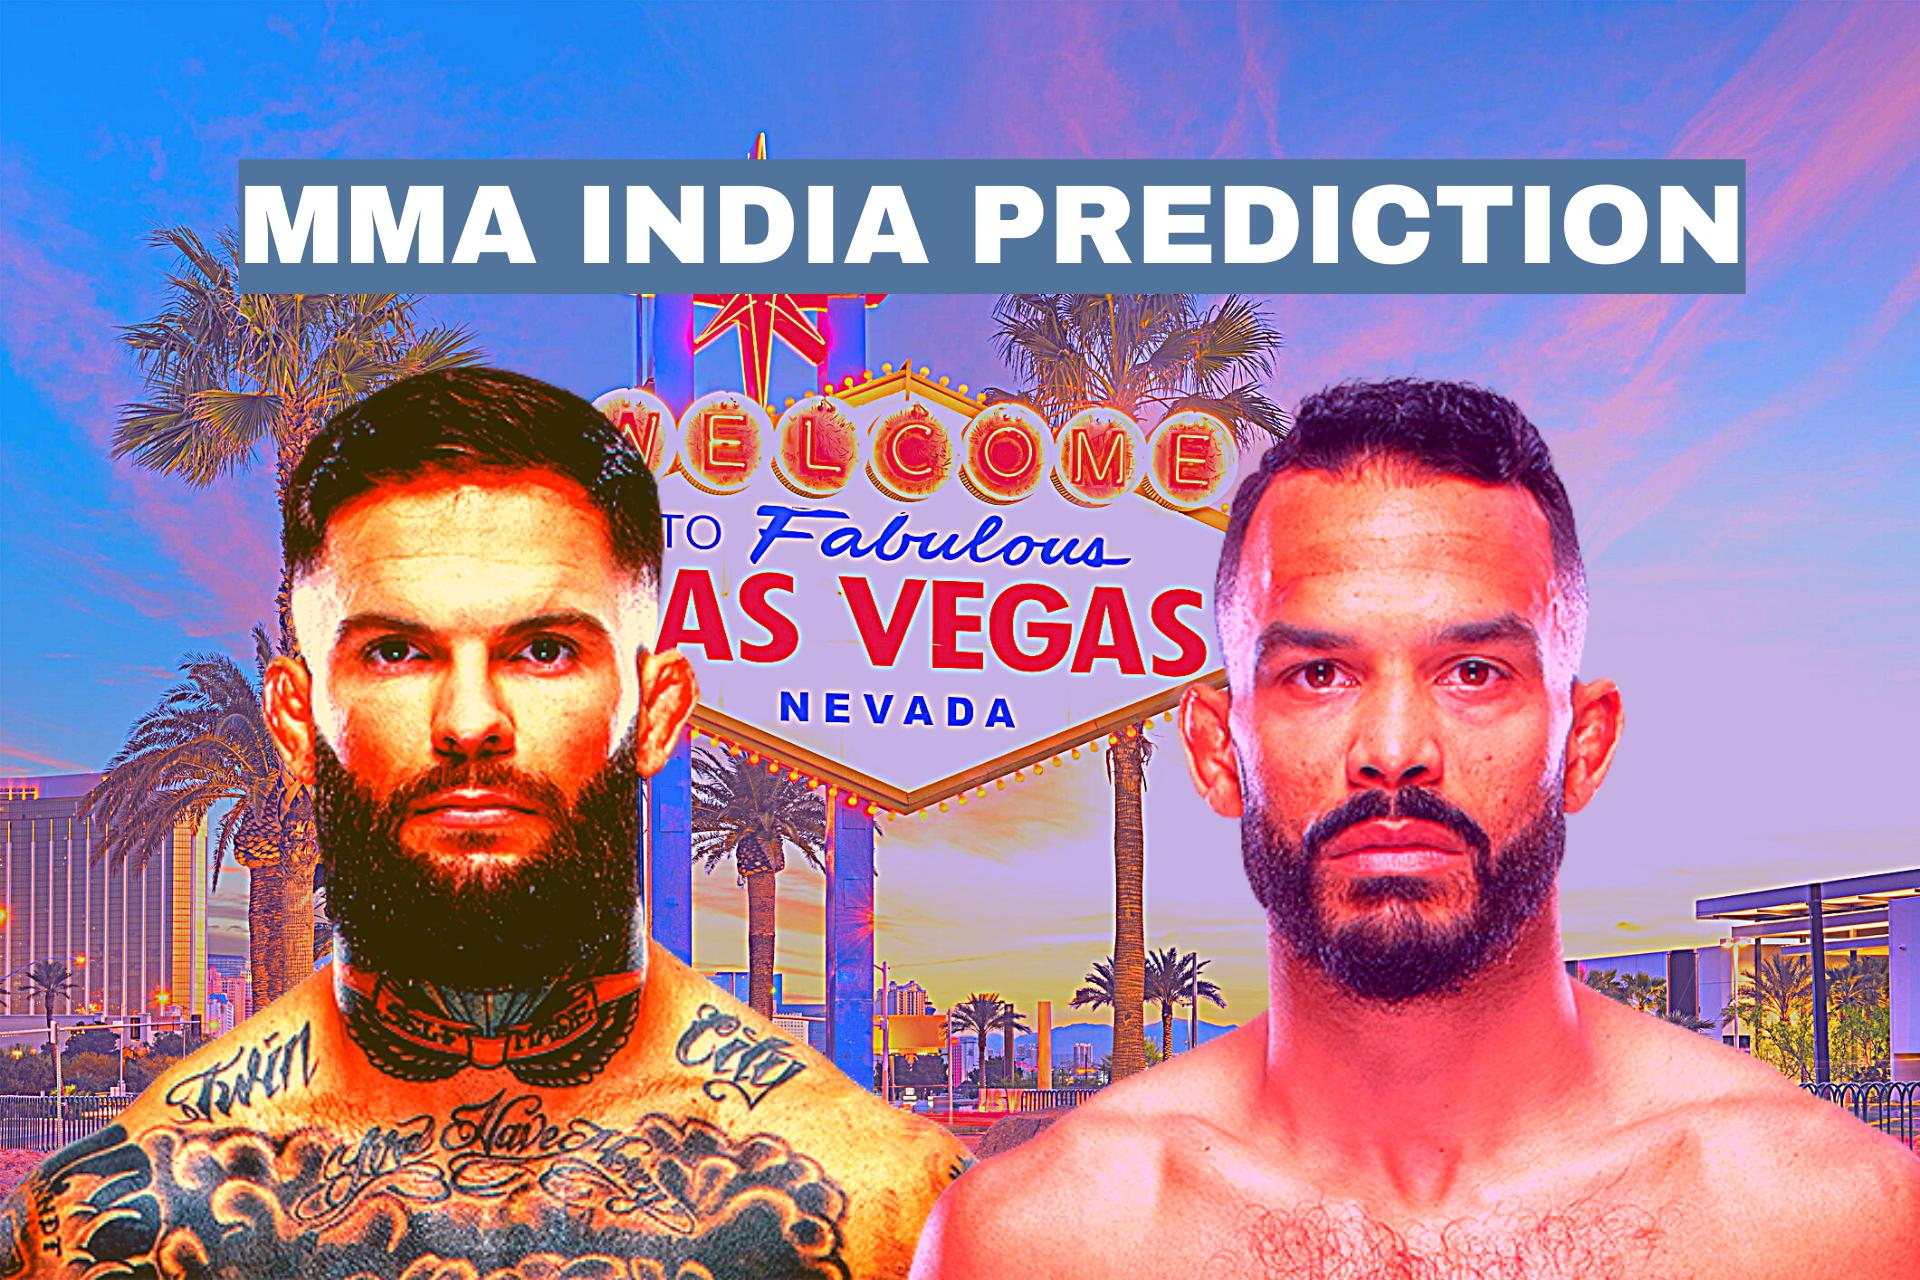 UFC Vegas 27: Font vs Garbrandt Betting Odds and Prediction - Garbrandt